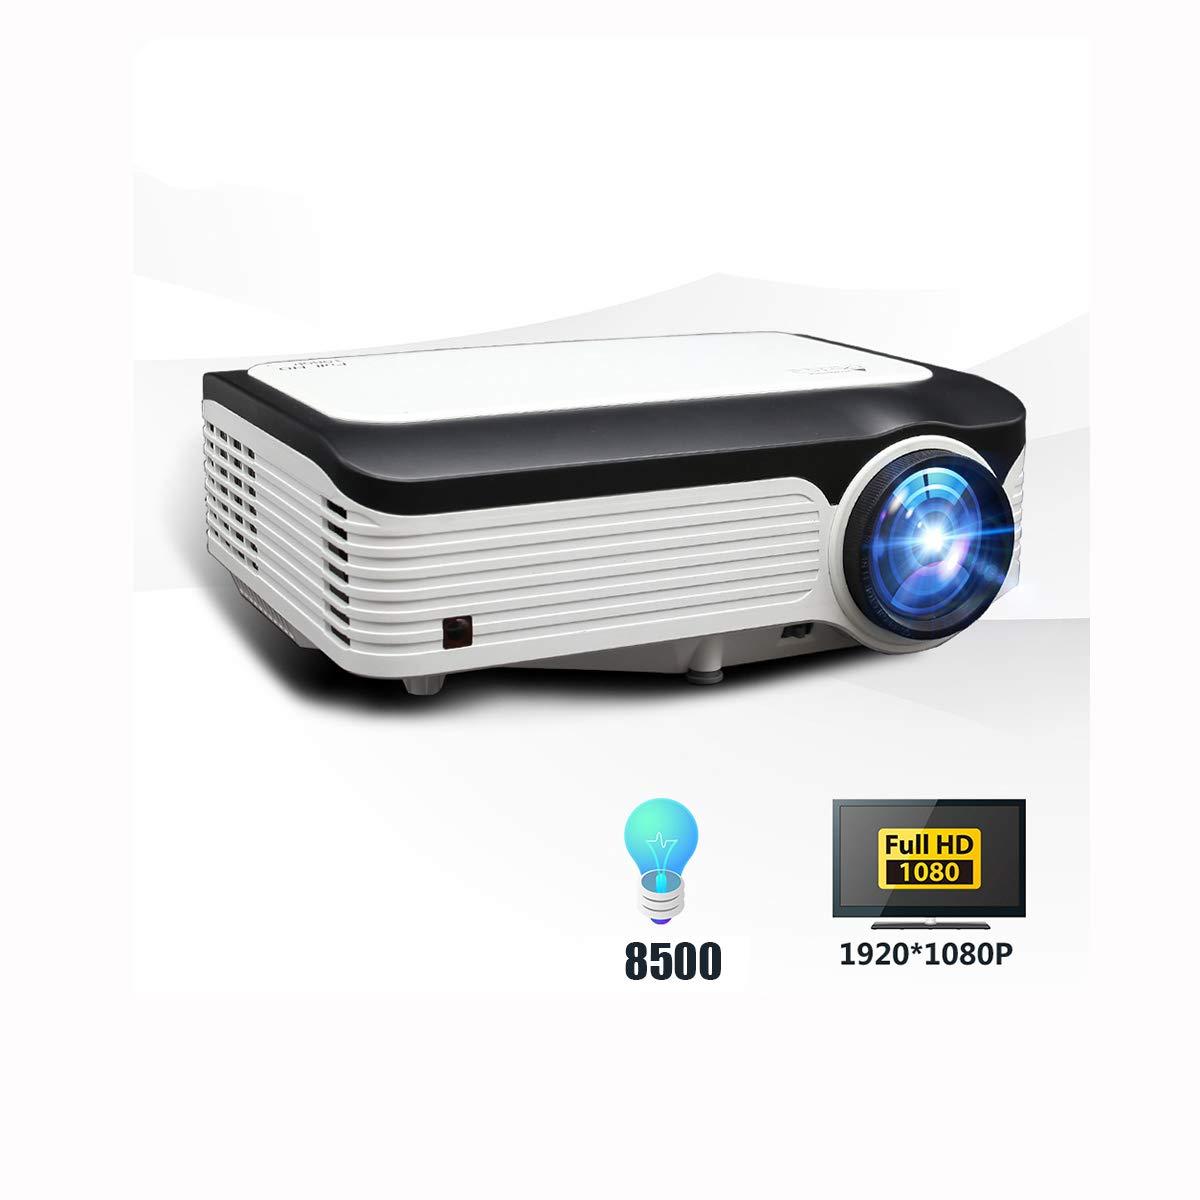 Ai LIFE Proyector LED Nativo 1080P Proyector de películas Full HD ...